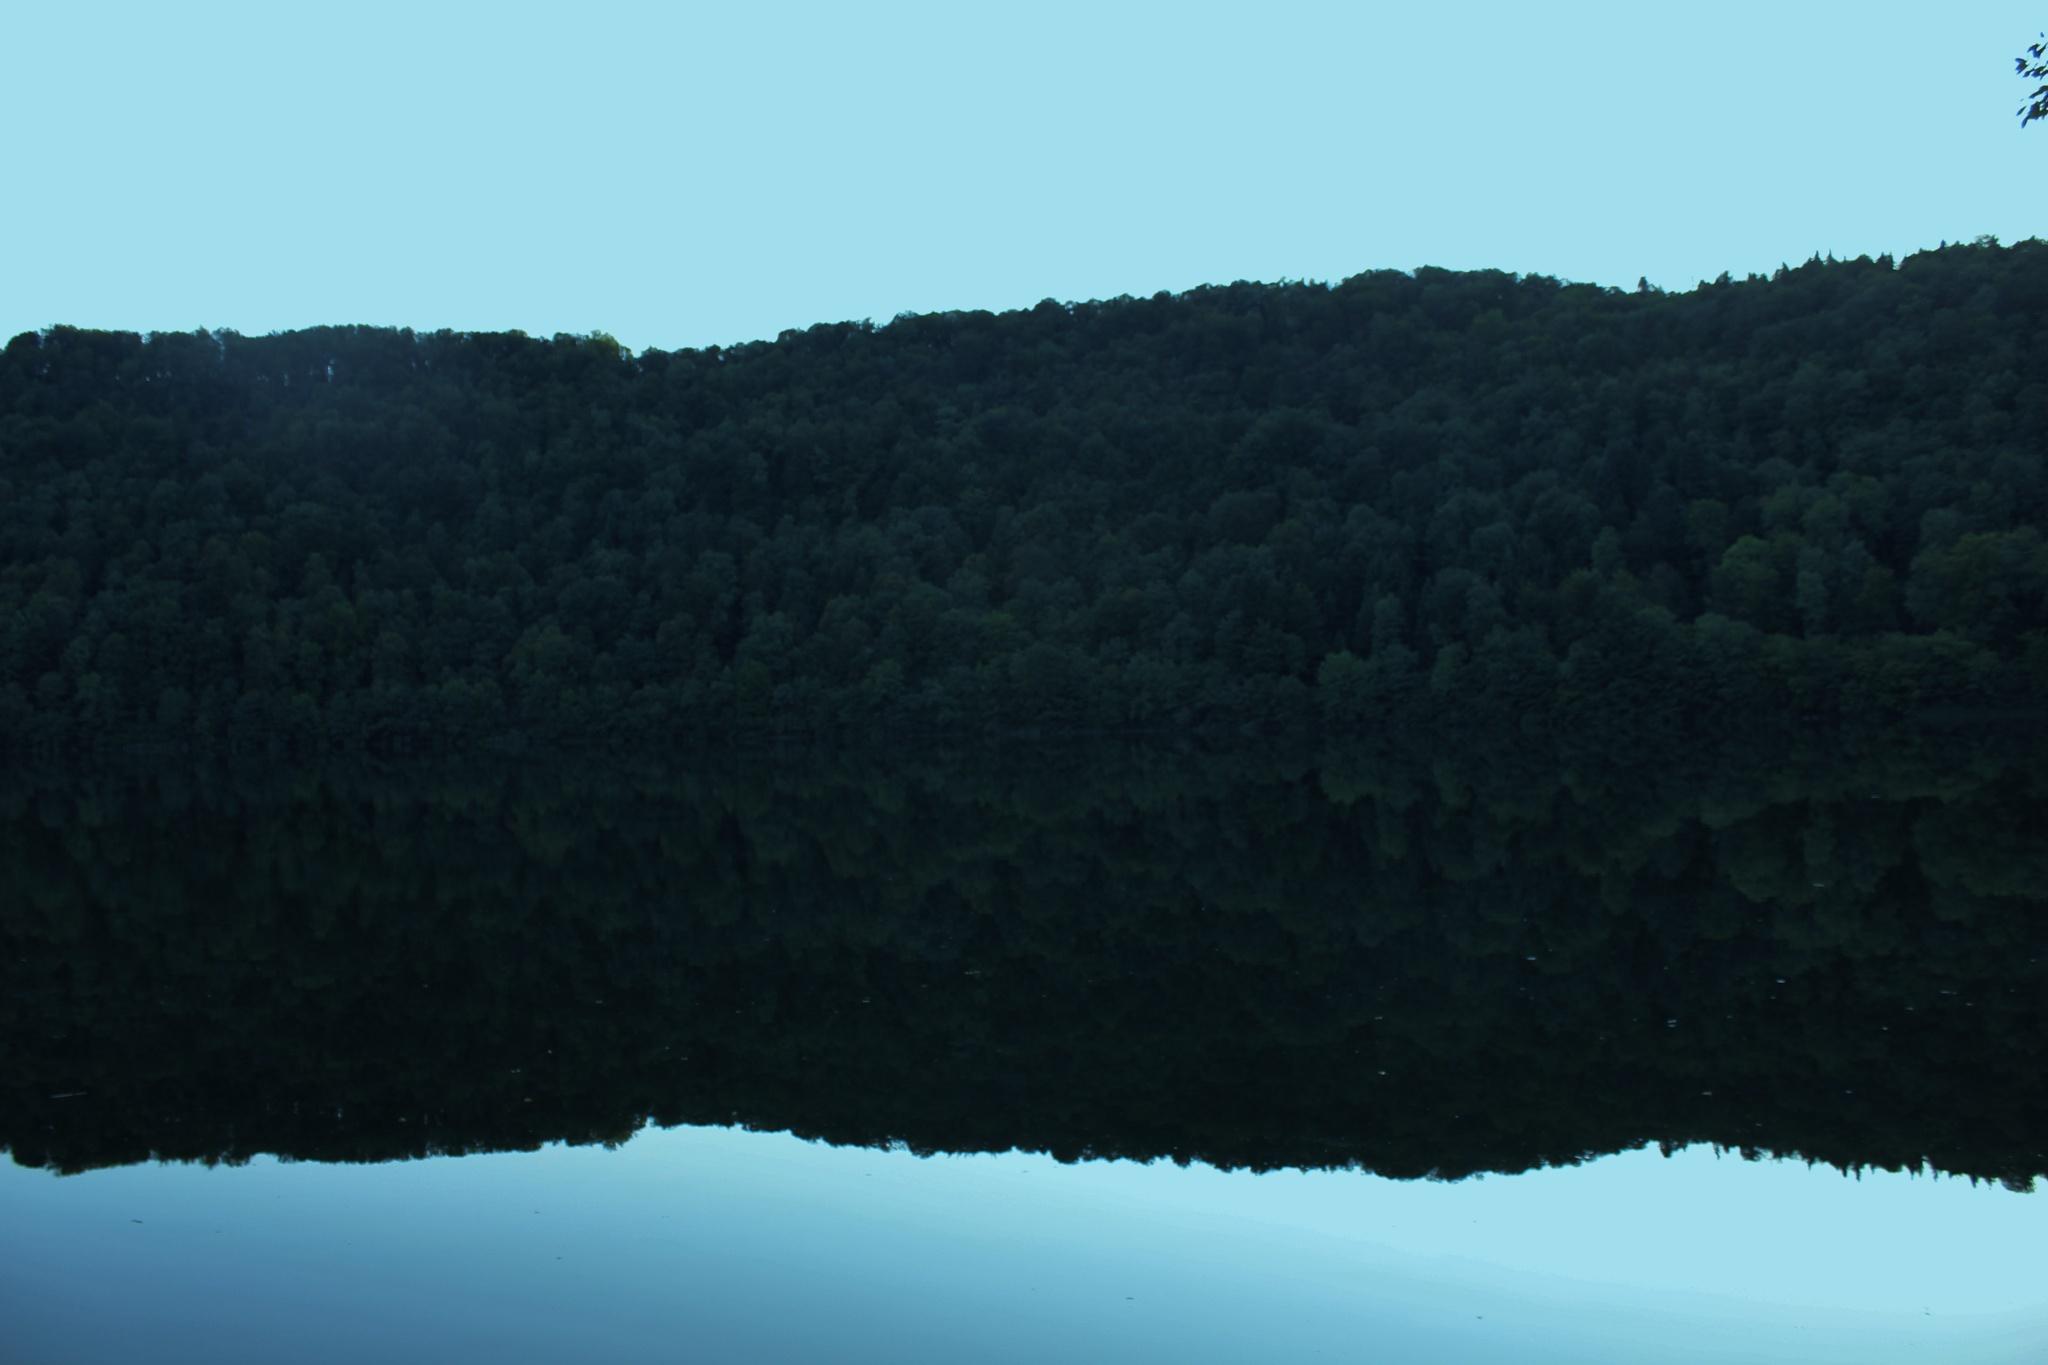 Stillness at Sunset by colin.savidge